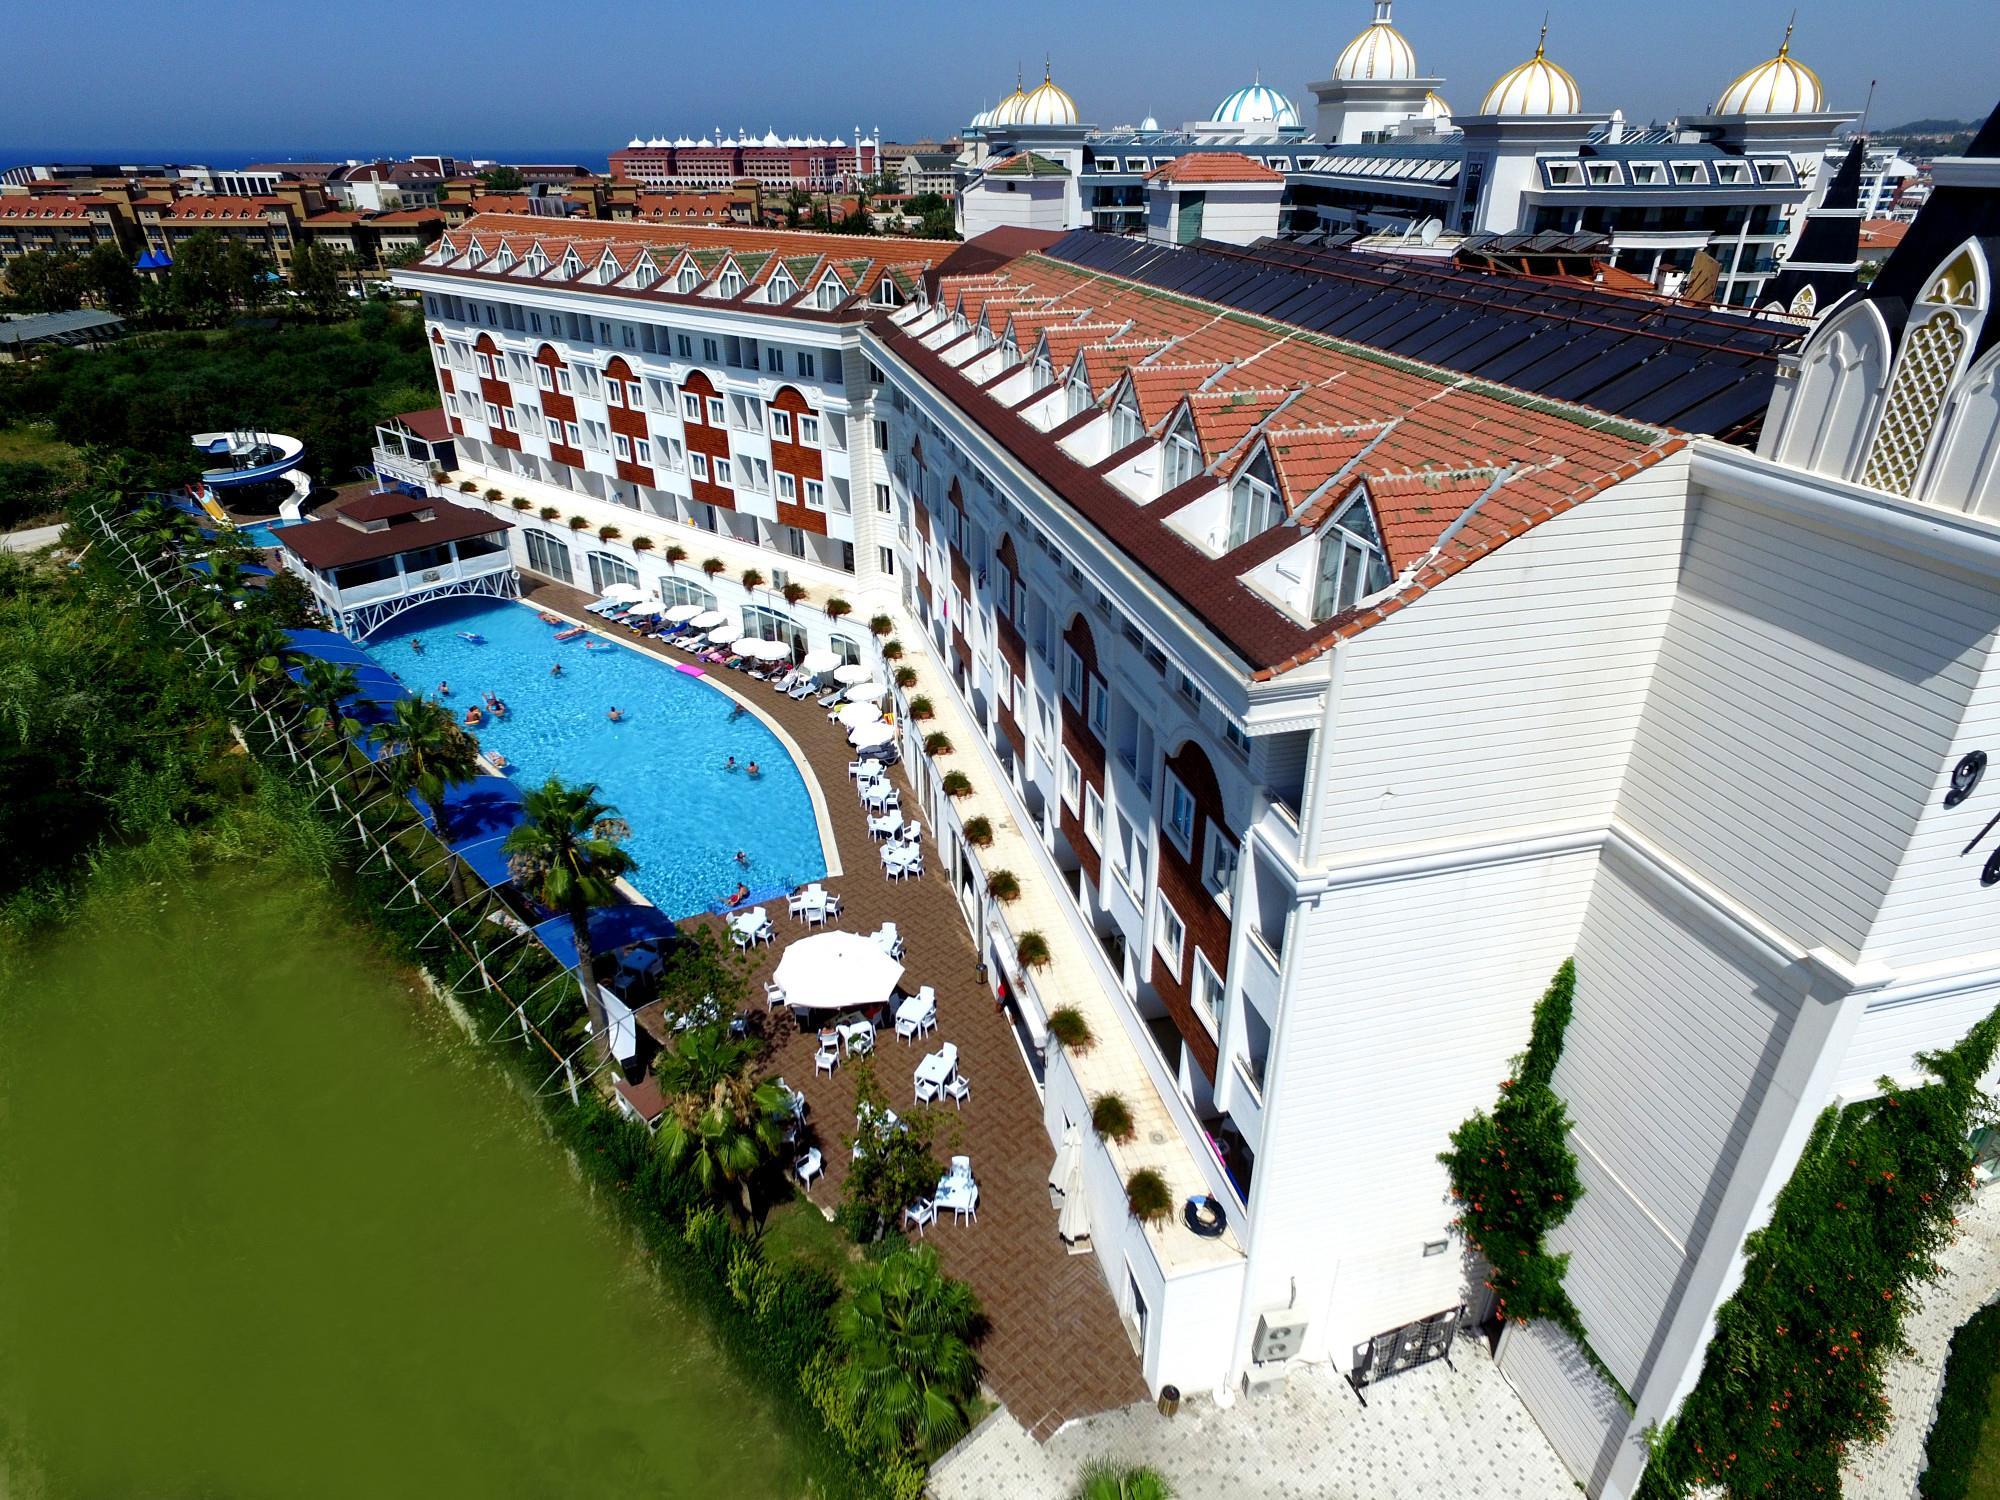 http://www.orextravel.sk/OREX/hotelphotos/side-royal-paradise-general-0015.jpg